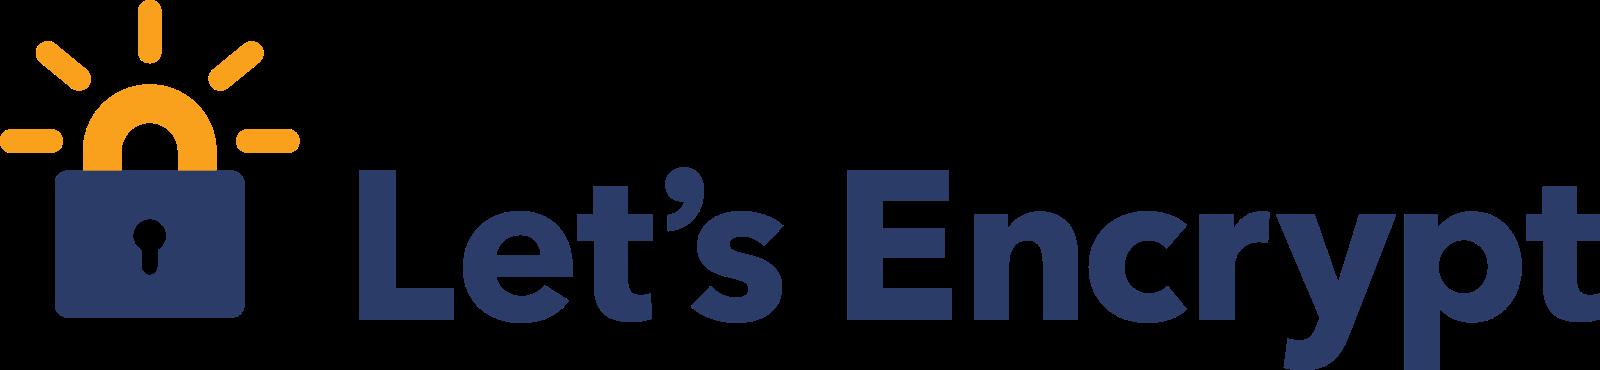 lets encrypt logo 2 - Let's Encrypt Logo